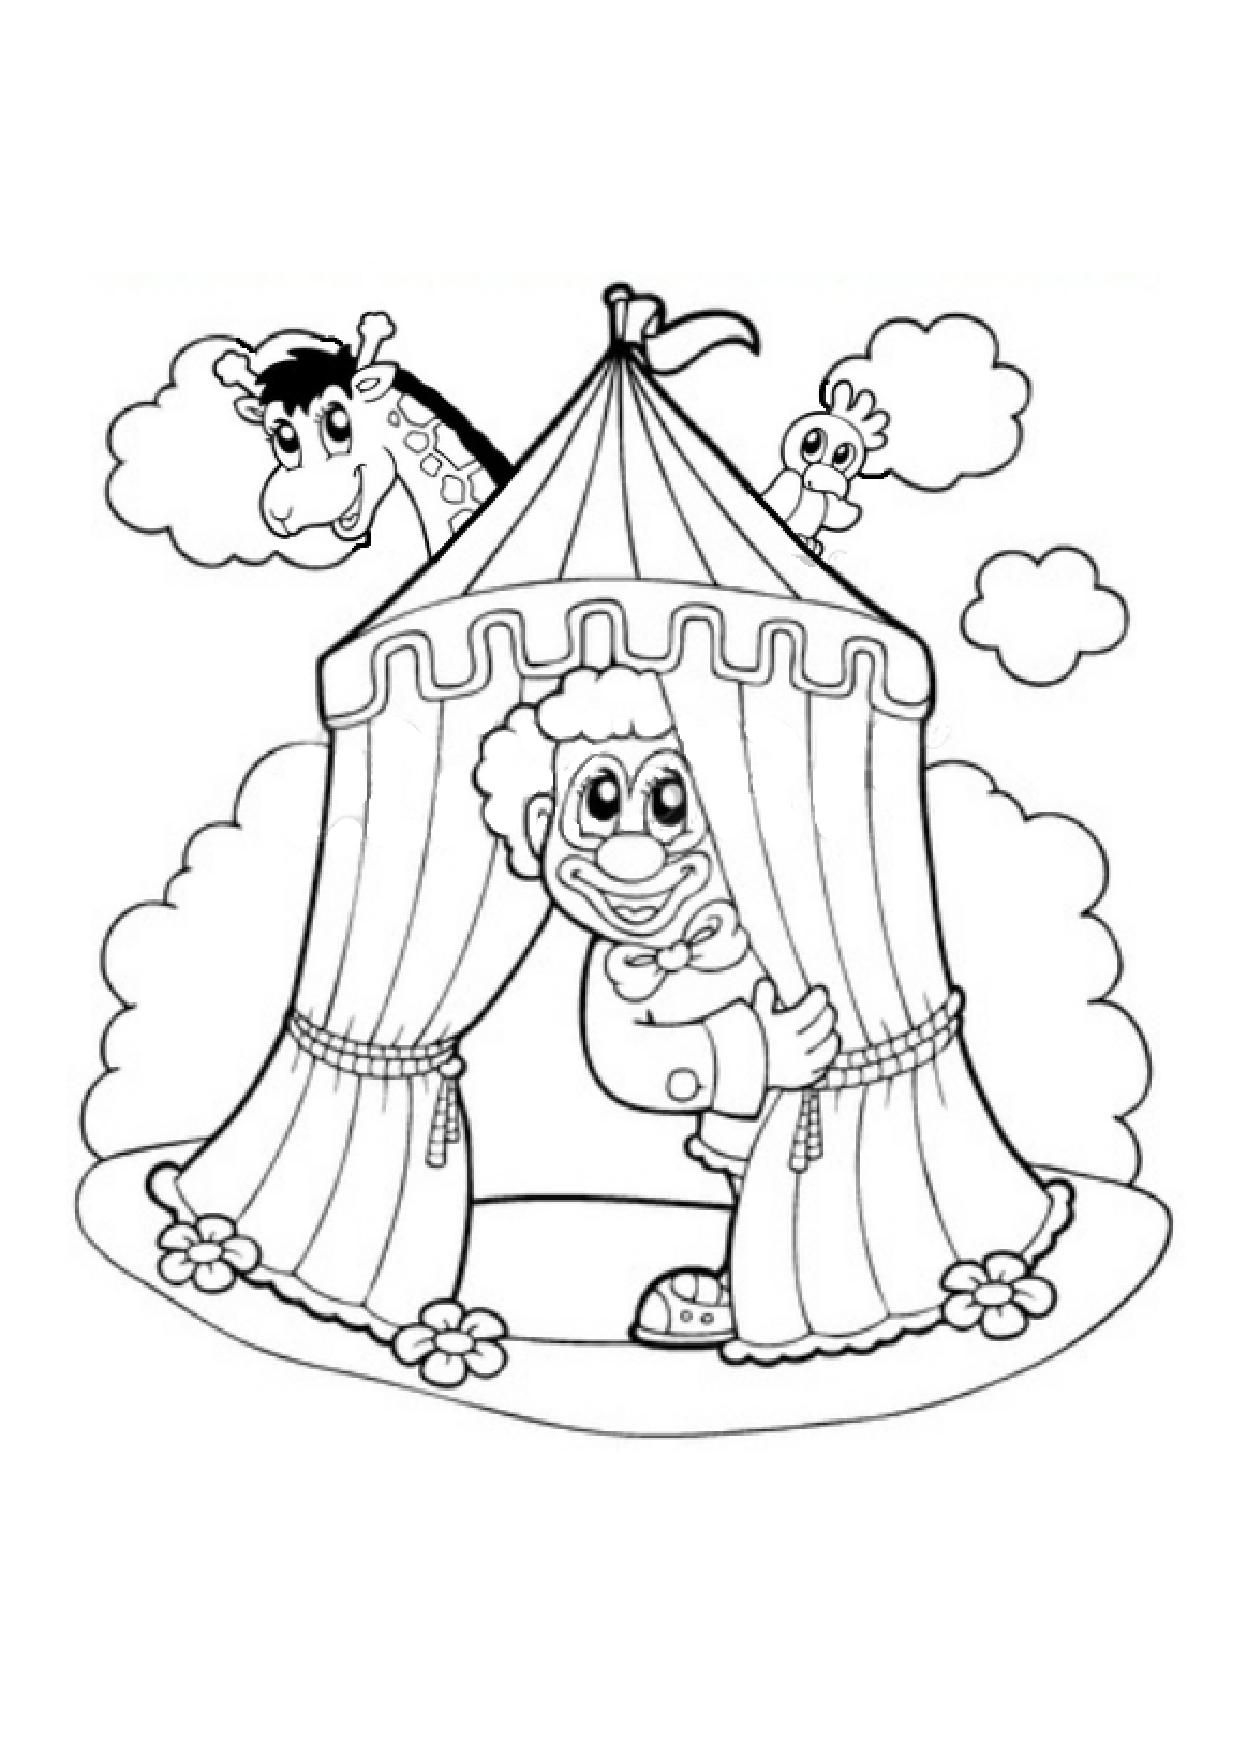 Coloriage Canrnaval encequiconcerne Coloriage Cirque Maternelle